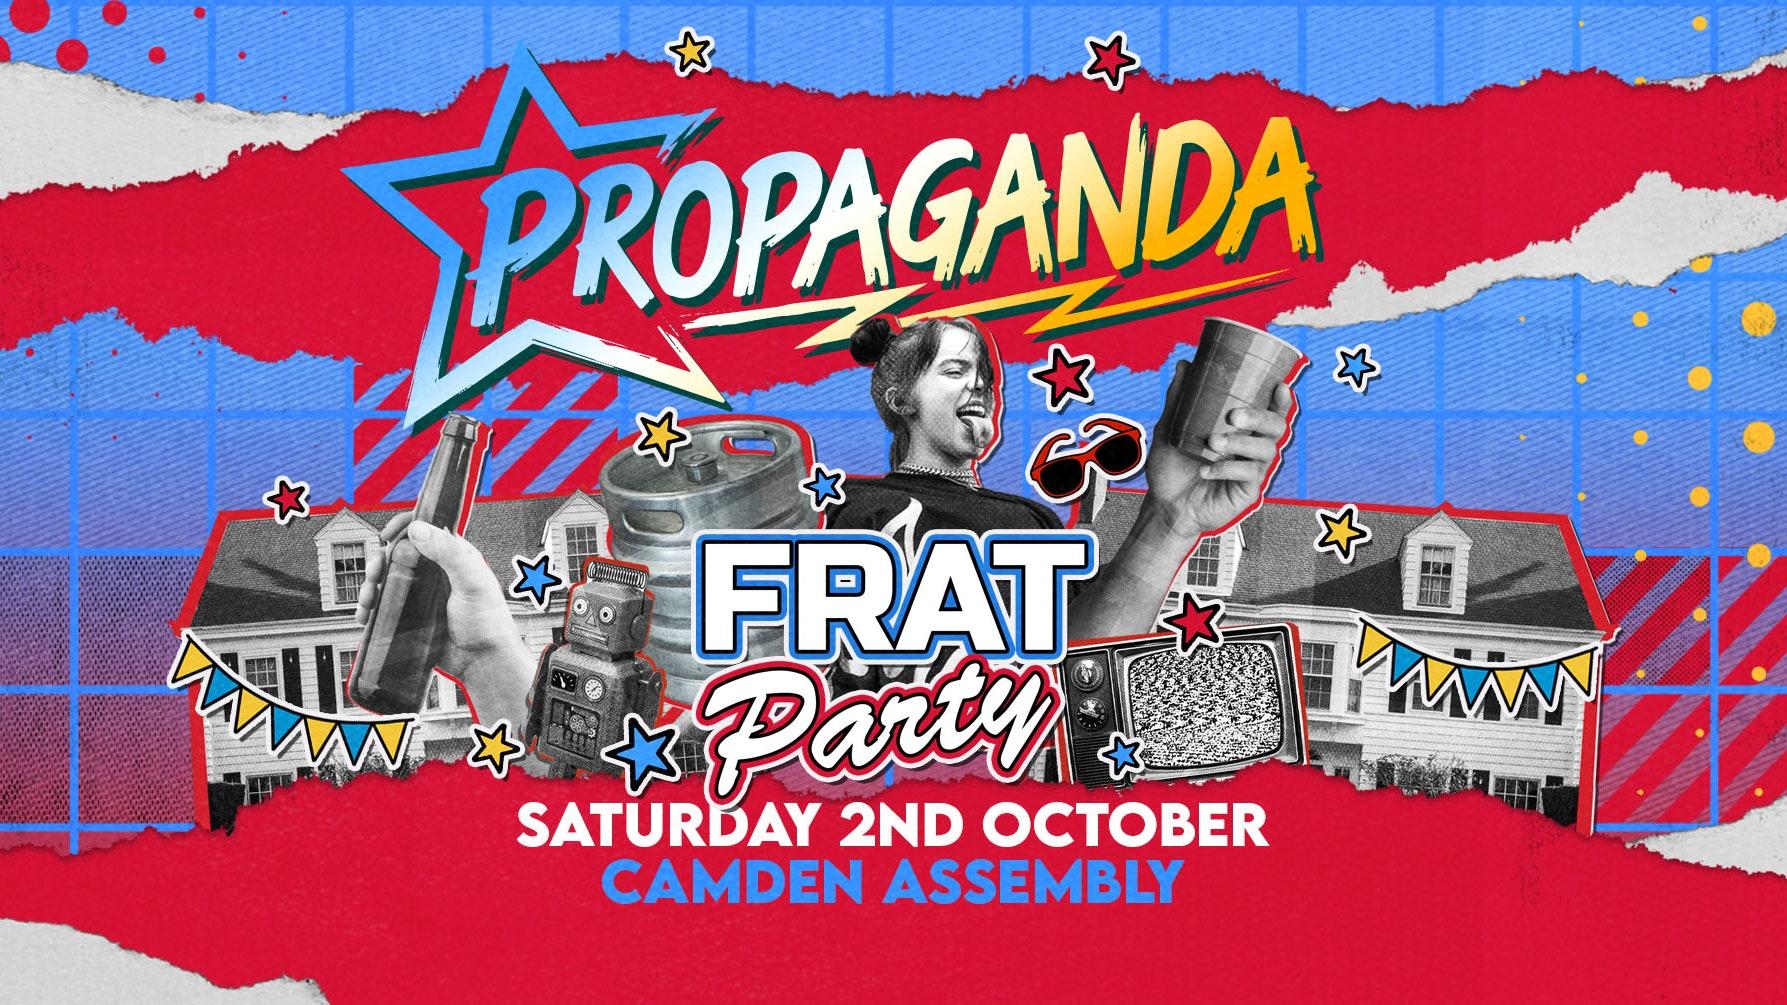 Propaganda London – Frat Party!